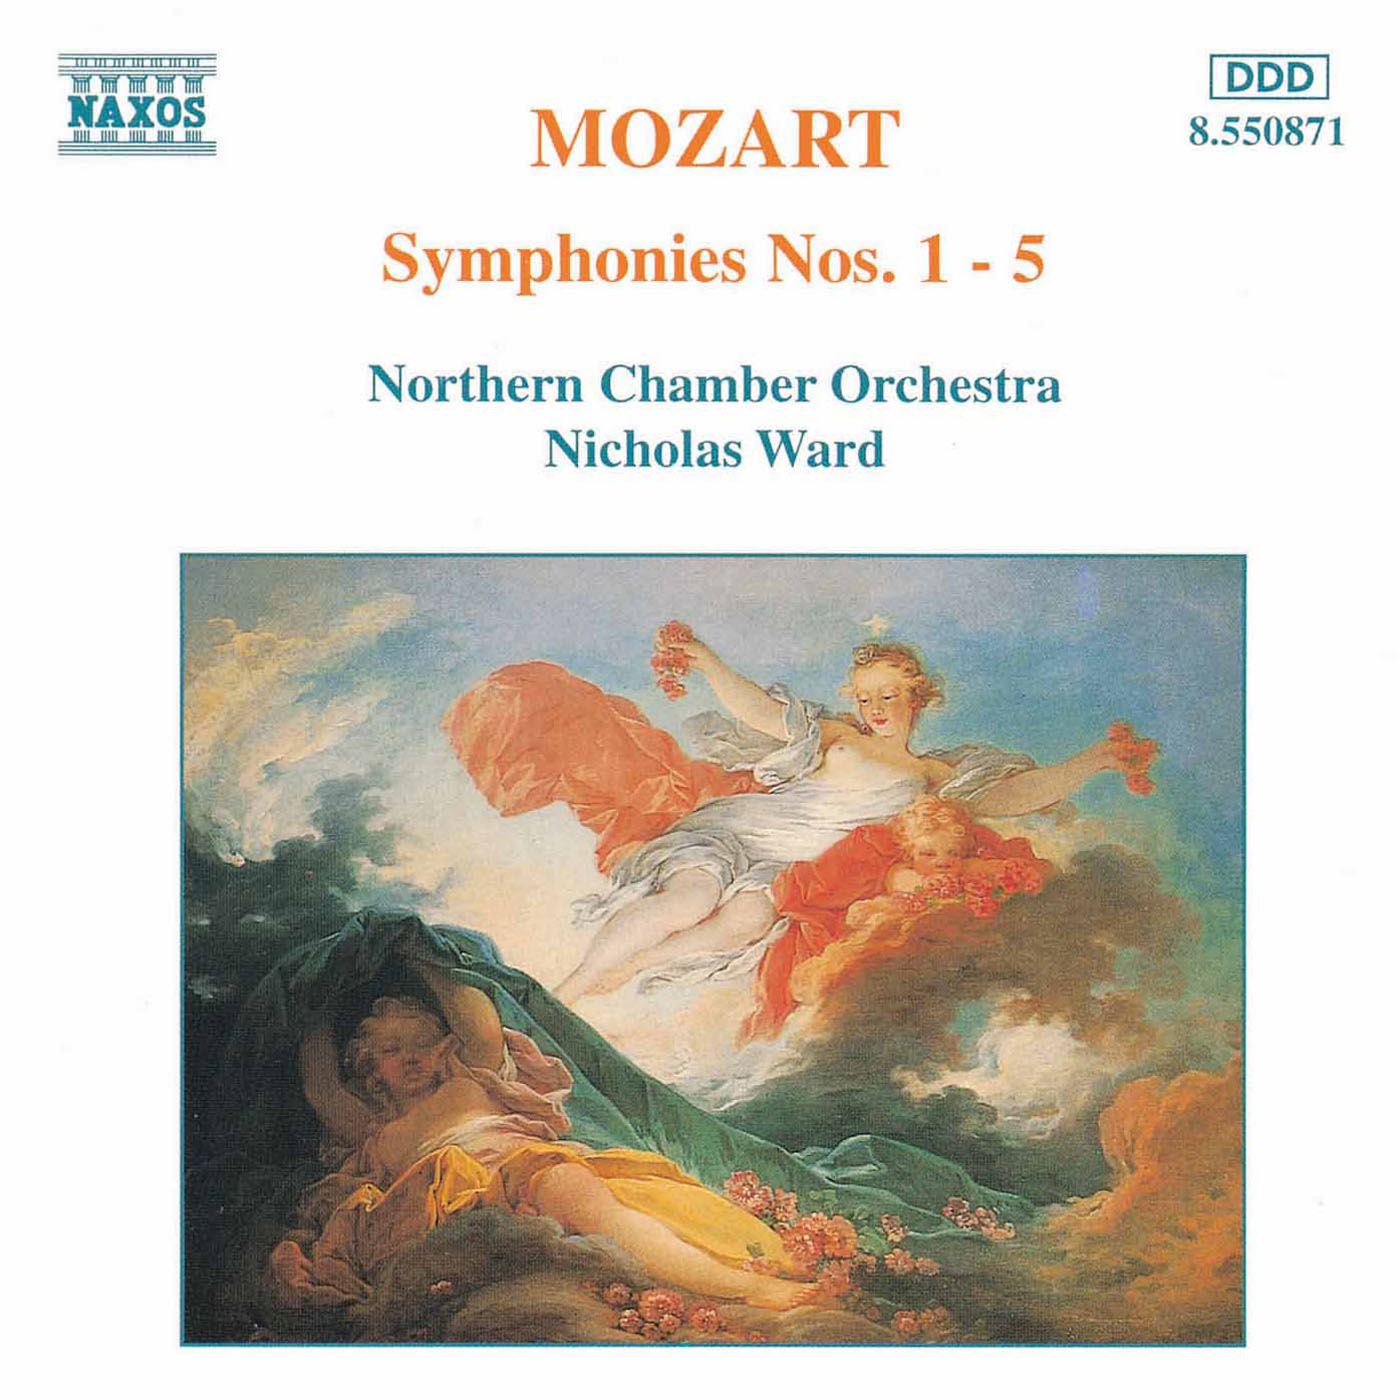 MOZART: Symphonies Nos  1 - 5 Classical Naxos